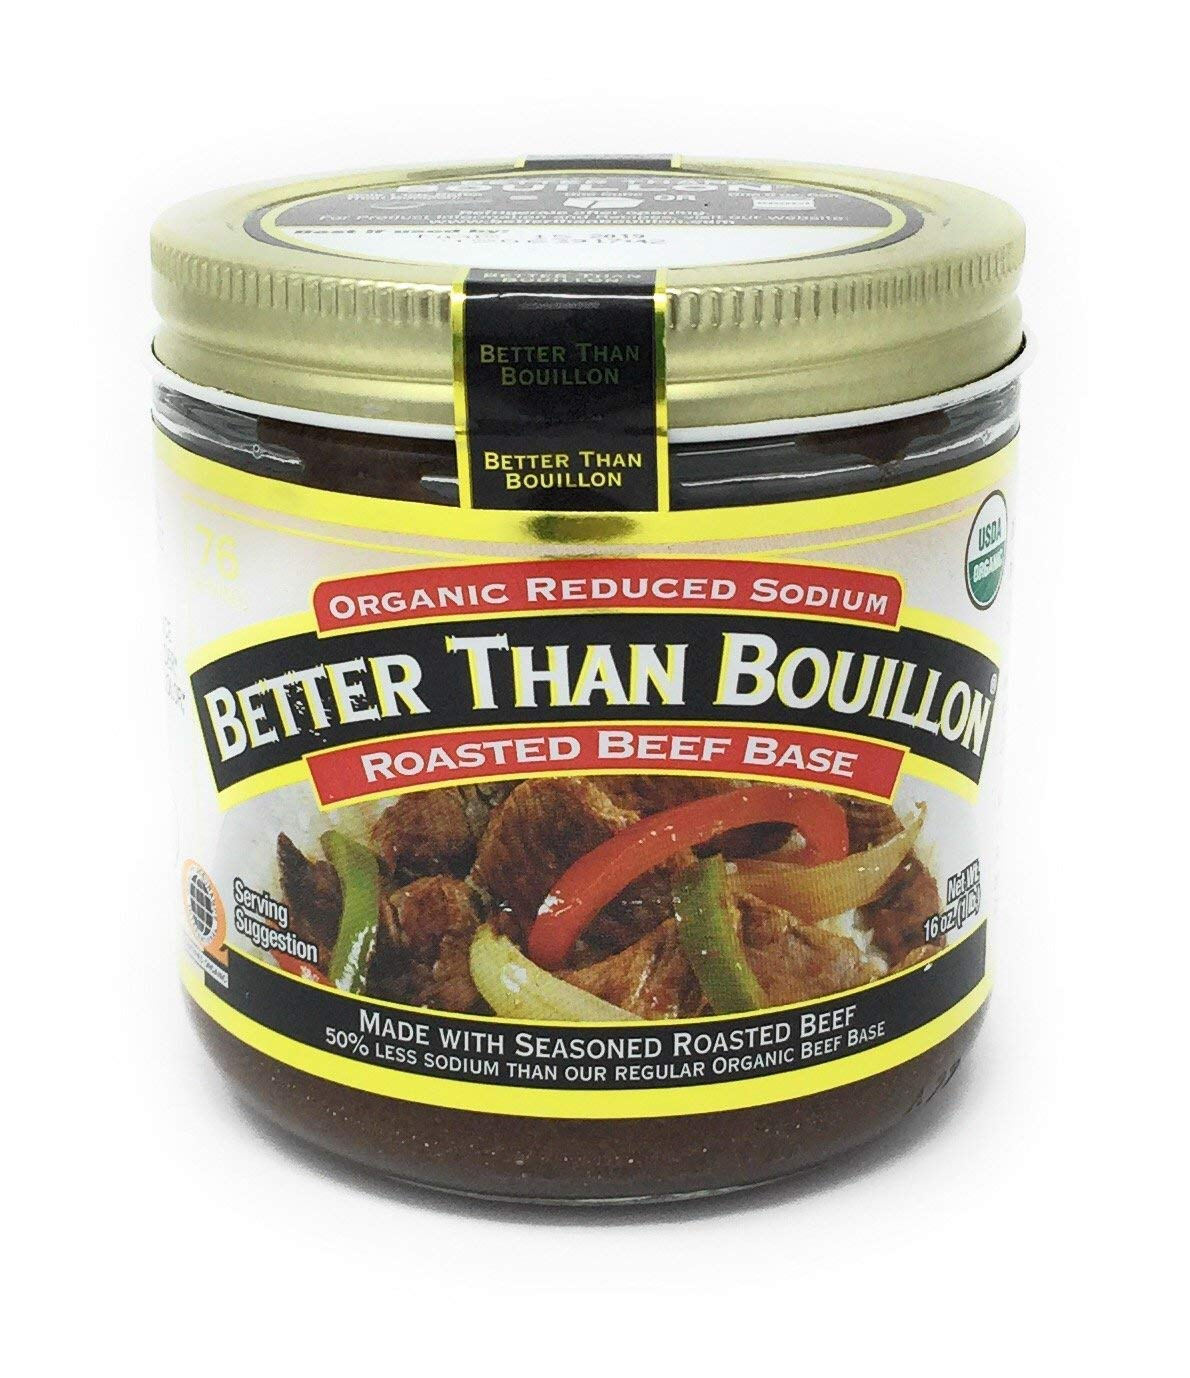 Better Than Bouillon Organic Roasted Beef Base, 16 oz Reduced Sodium